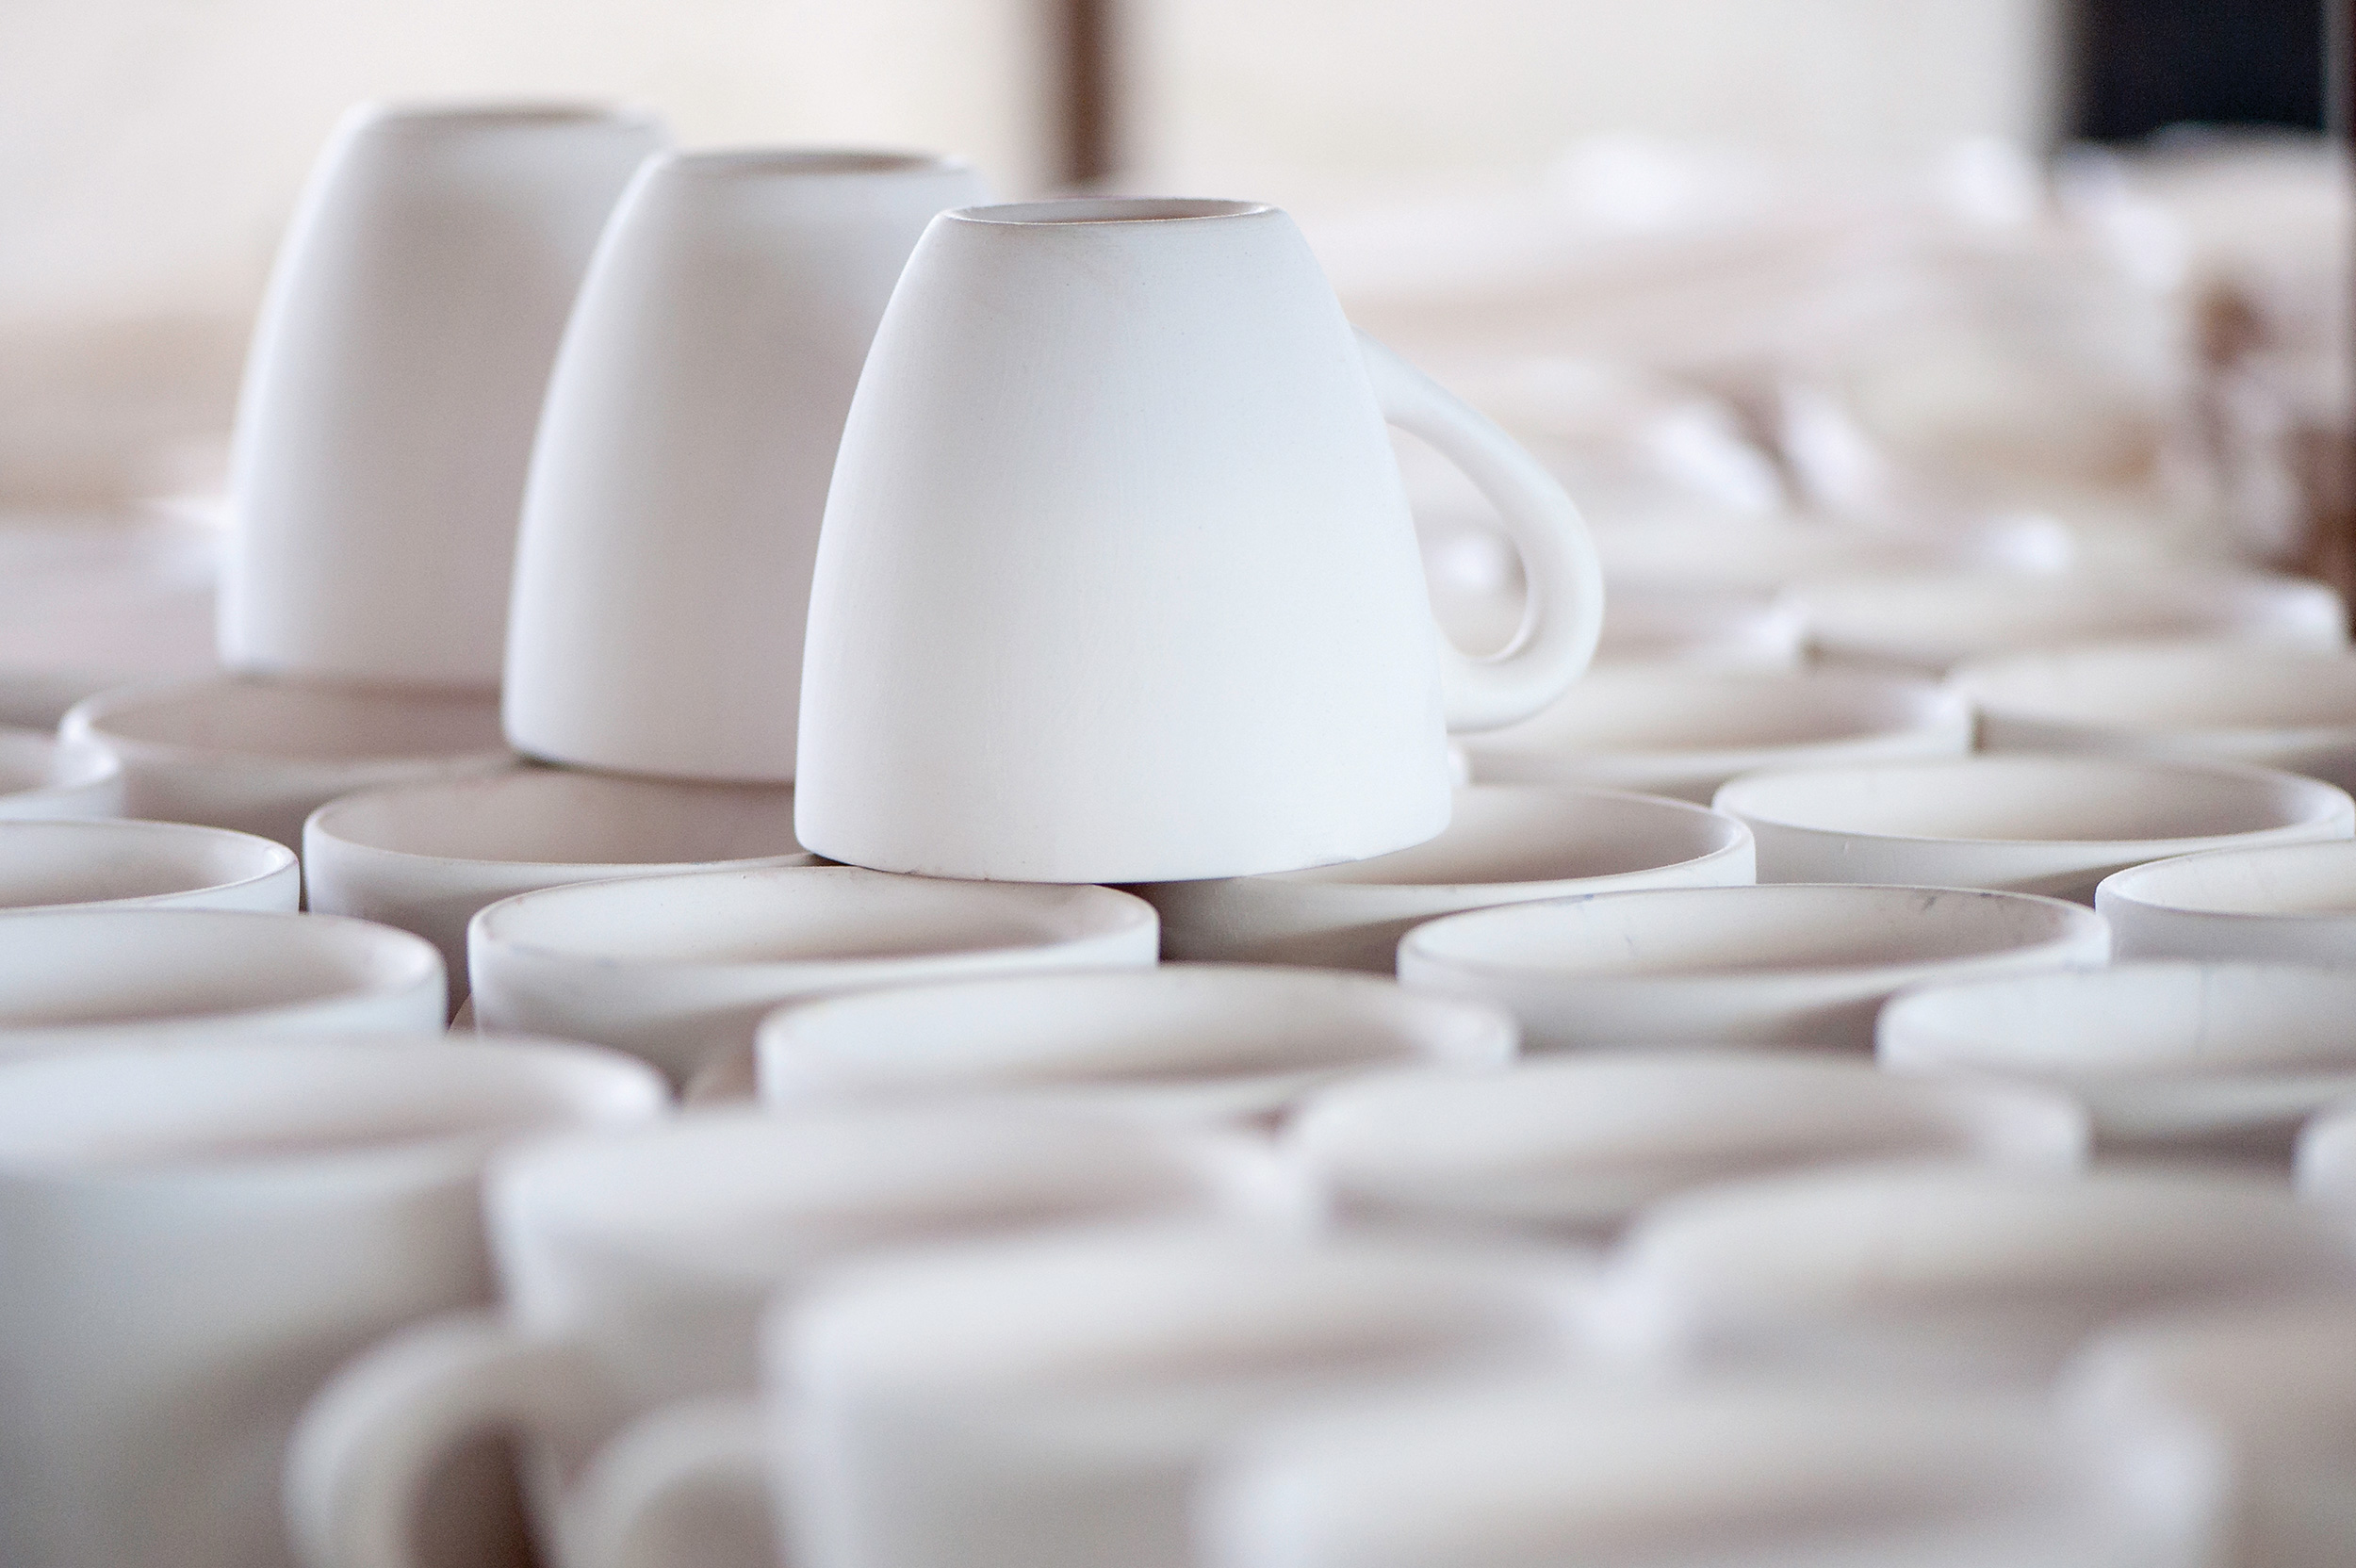 kapula-handmade-ceramics-plain-white-bisque-coffee-mugs.jpg